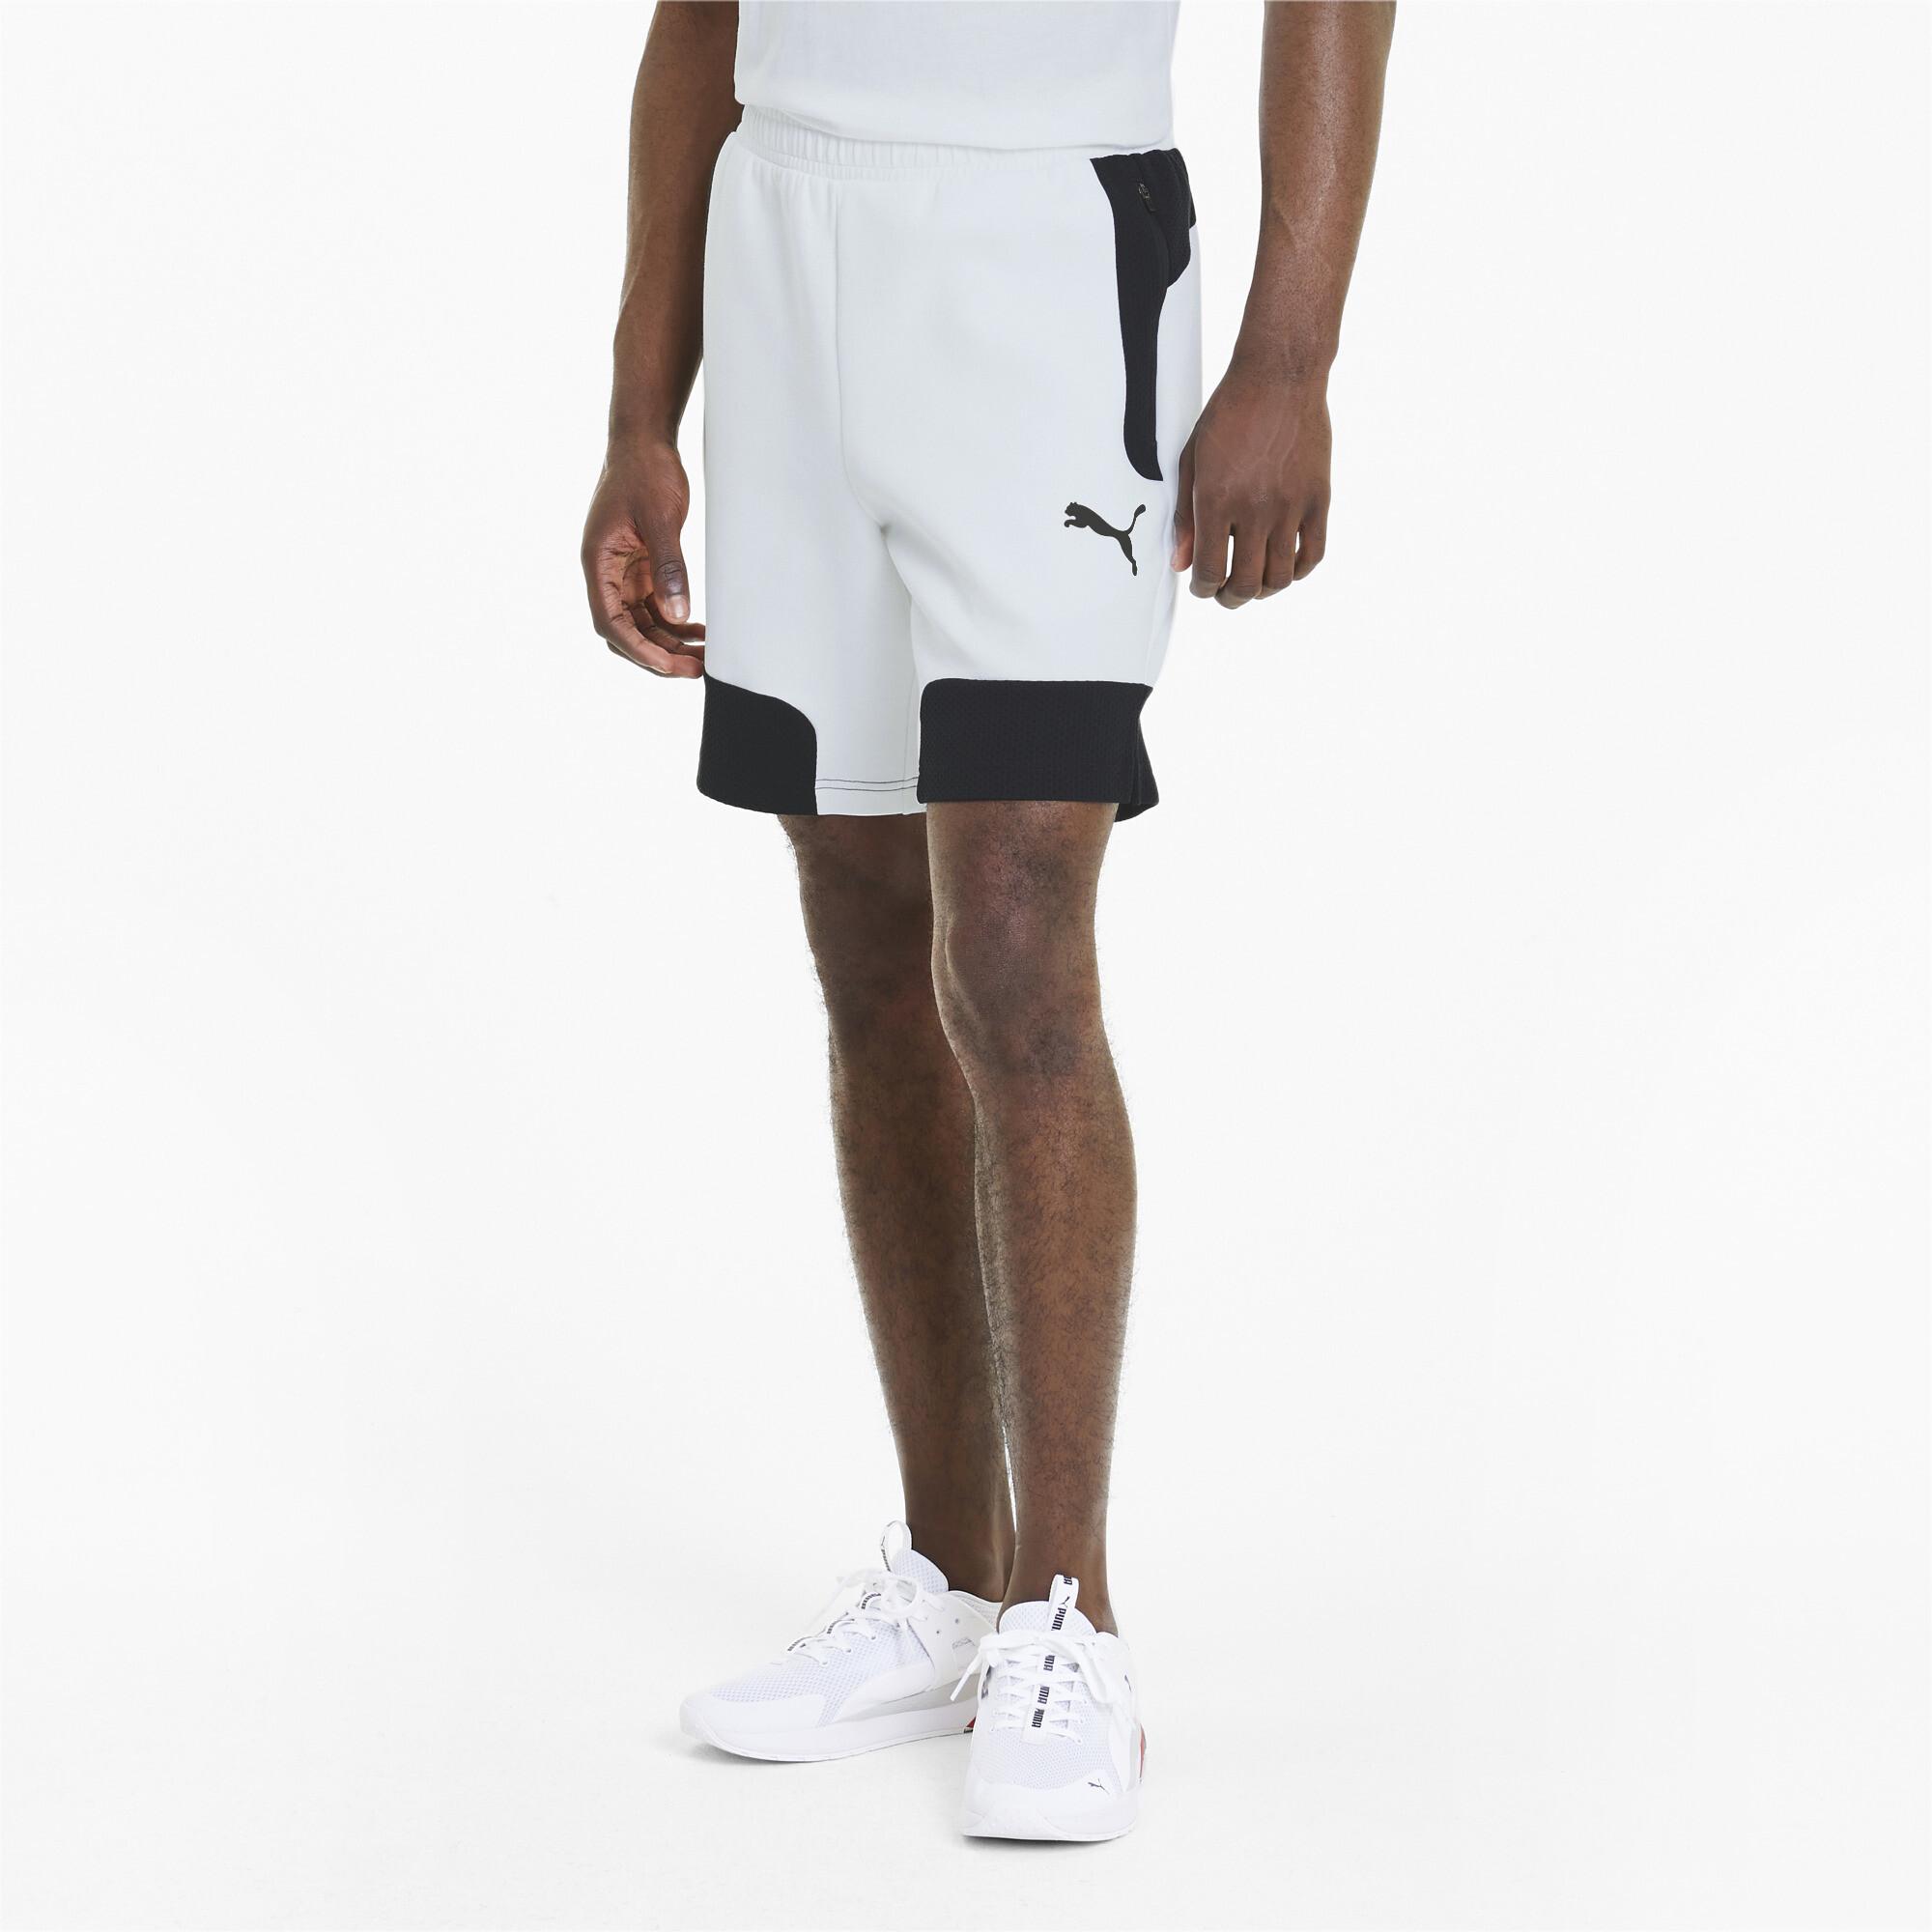 PUMA-Evostripe-Men-039-s-Shorts-Men-Knitted-Shorts-Basics thumbnail 20